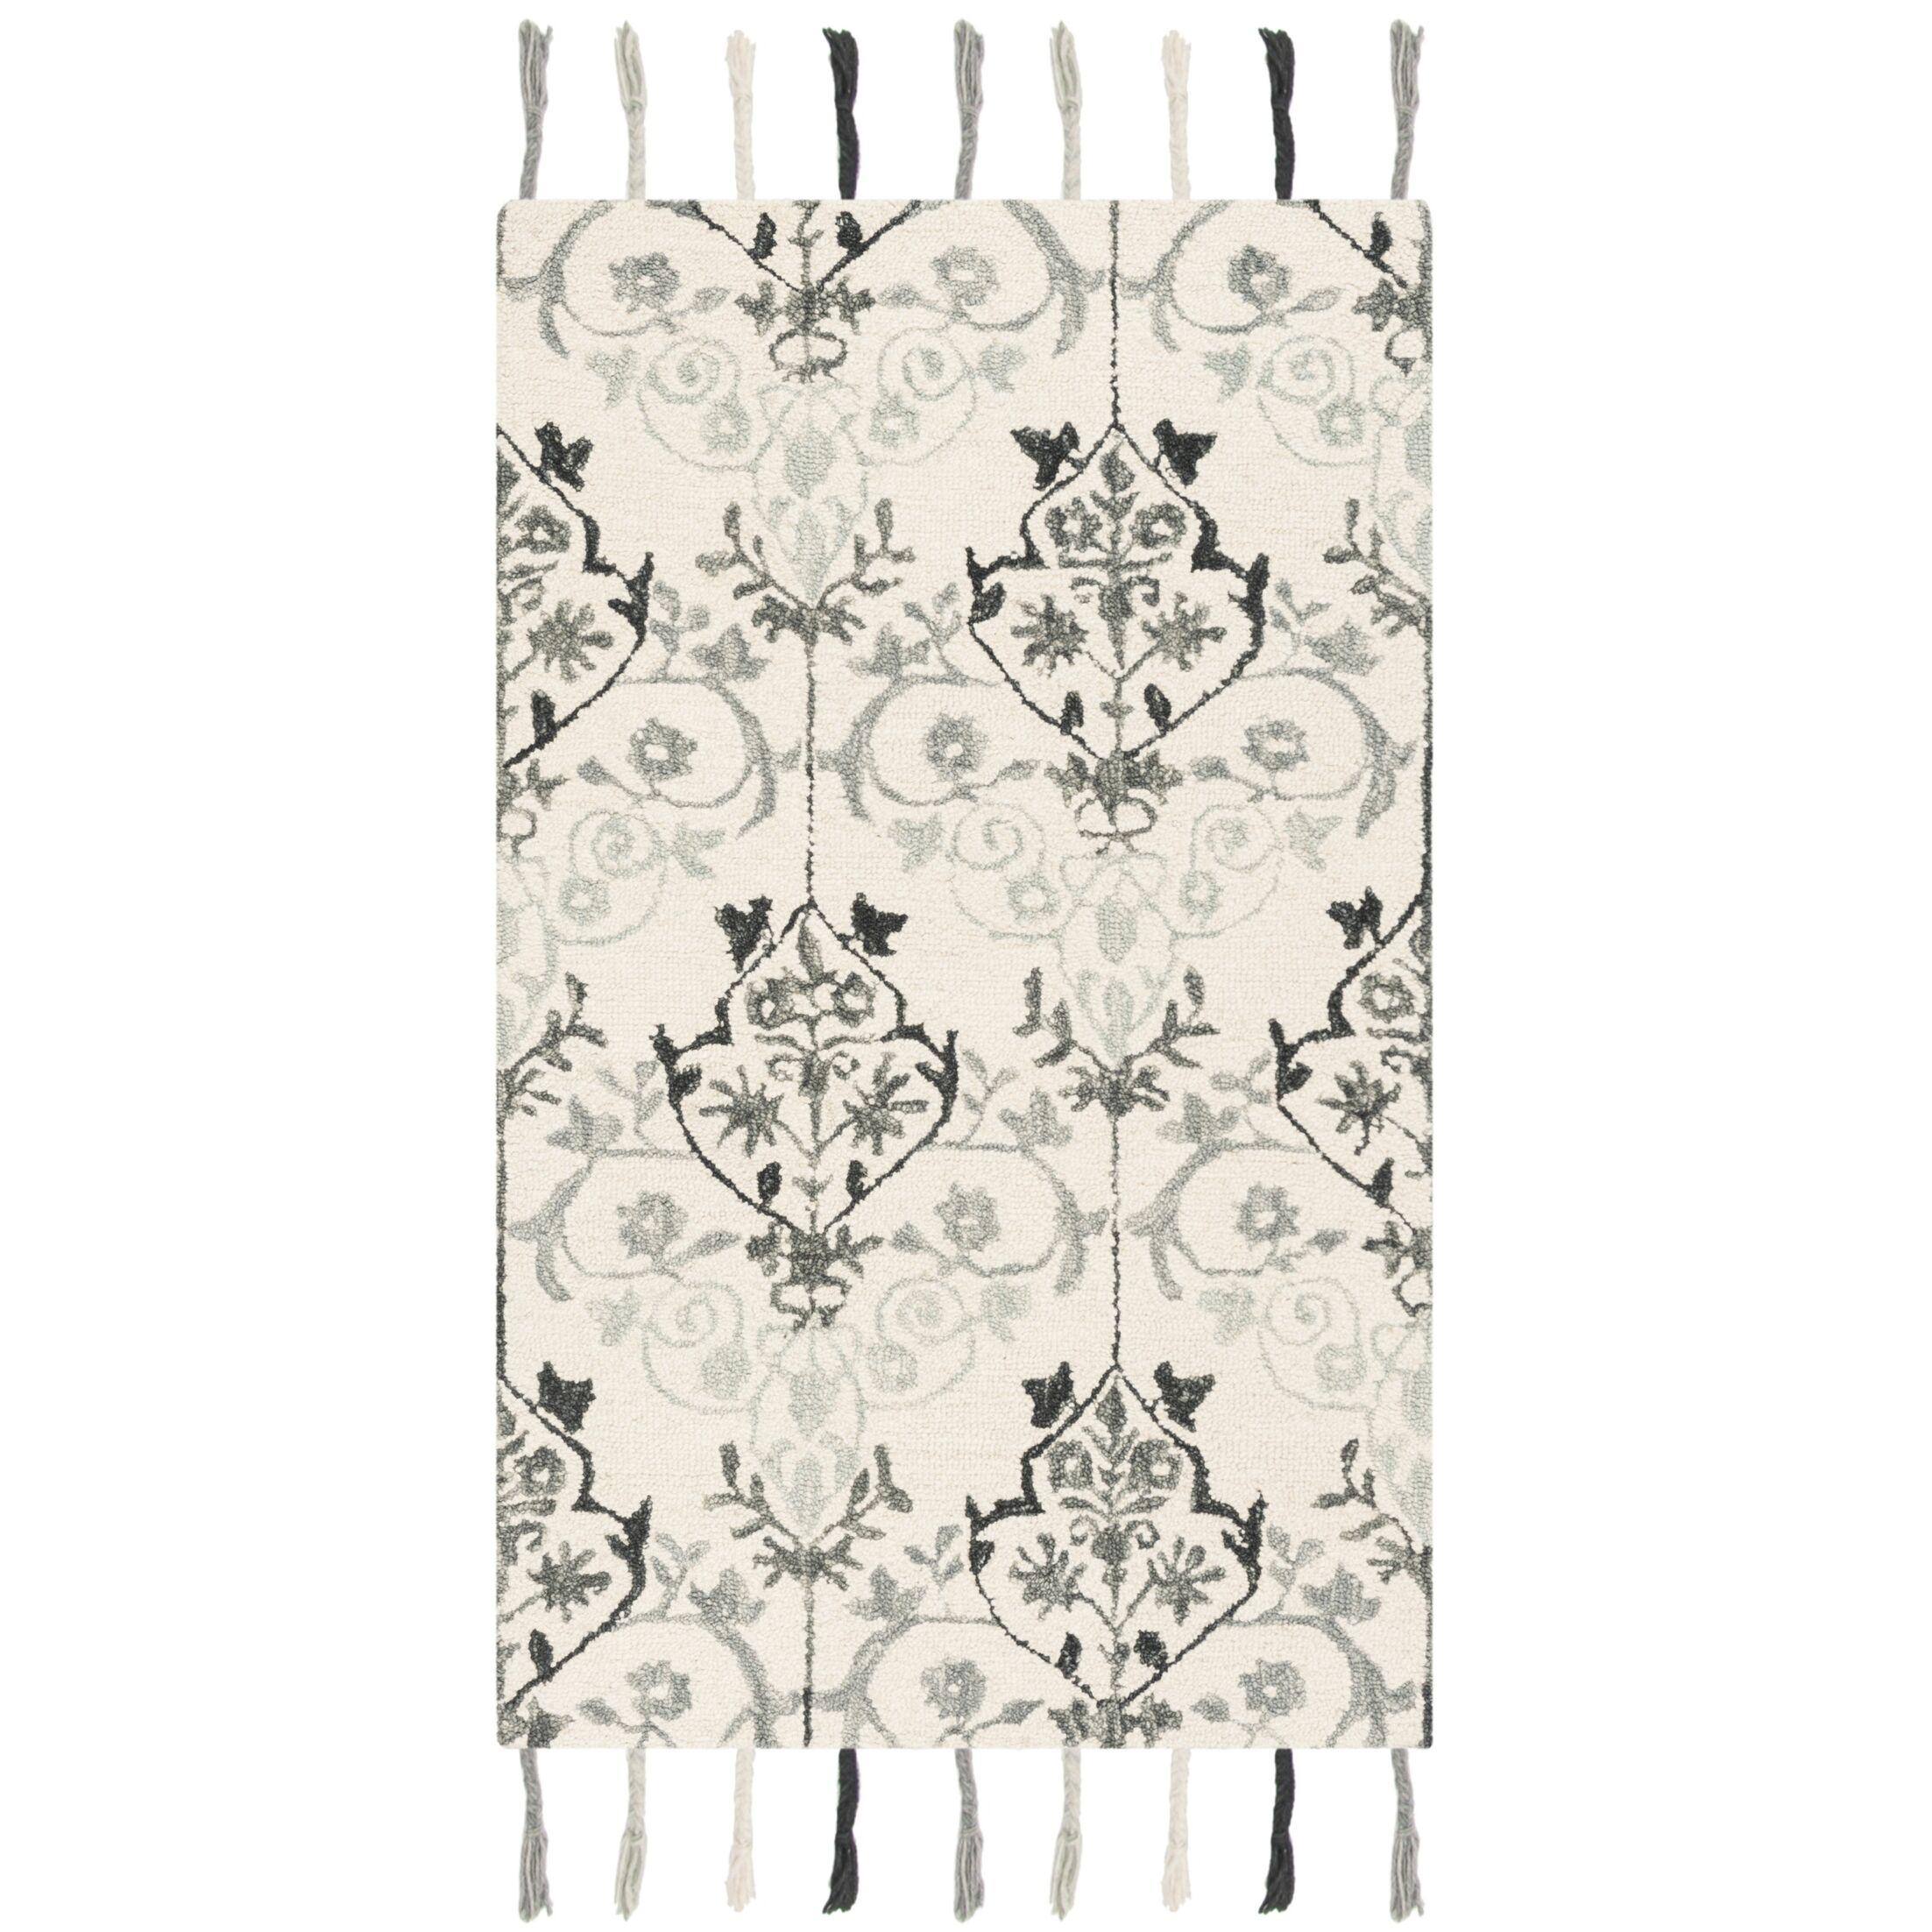 Niederanven Hand Tufted Wool Ivory/Gray Ikat Area Rug Rug Size: Runner 2'3